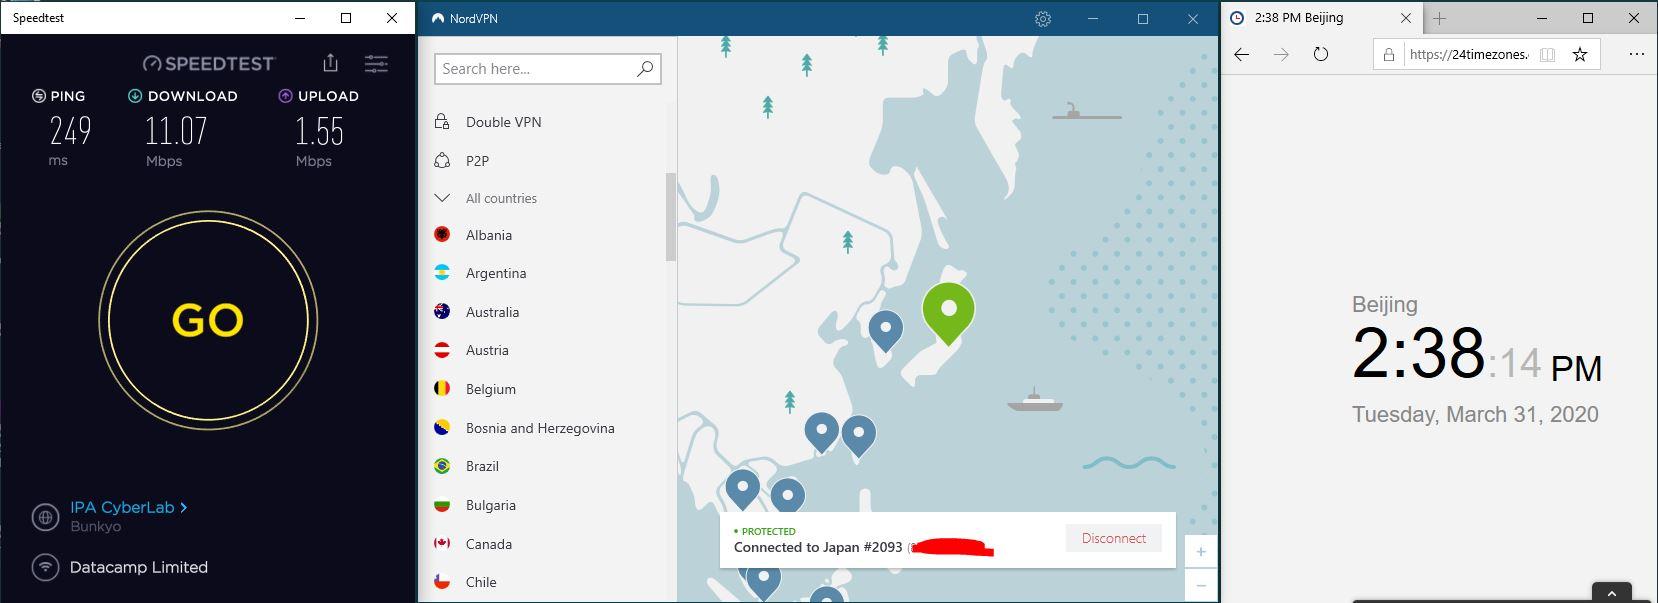 Windows10 NordVPN 混淆关闭 Japan #2093 中国VPN翻墙 科学上网 SpeedTest测速-20200331